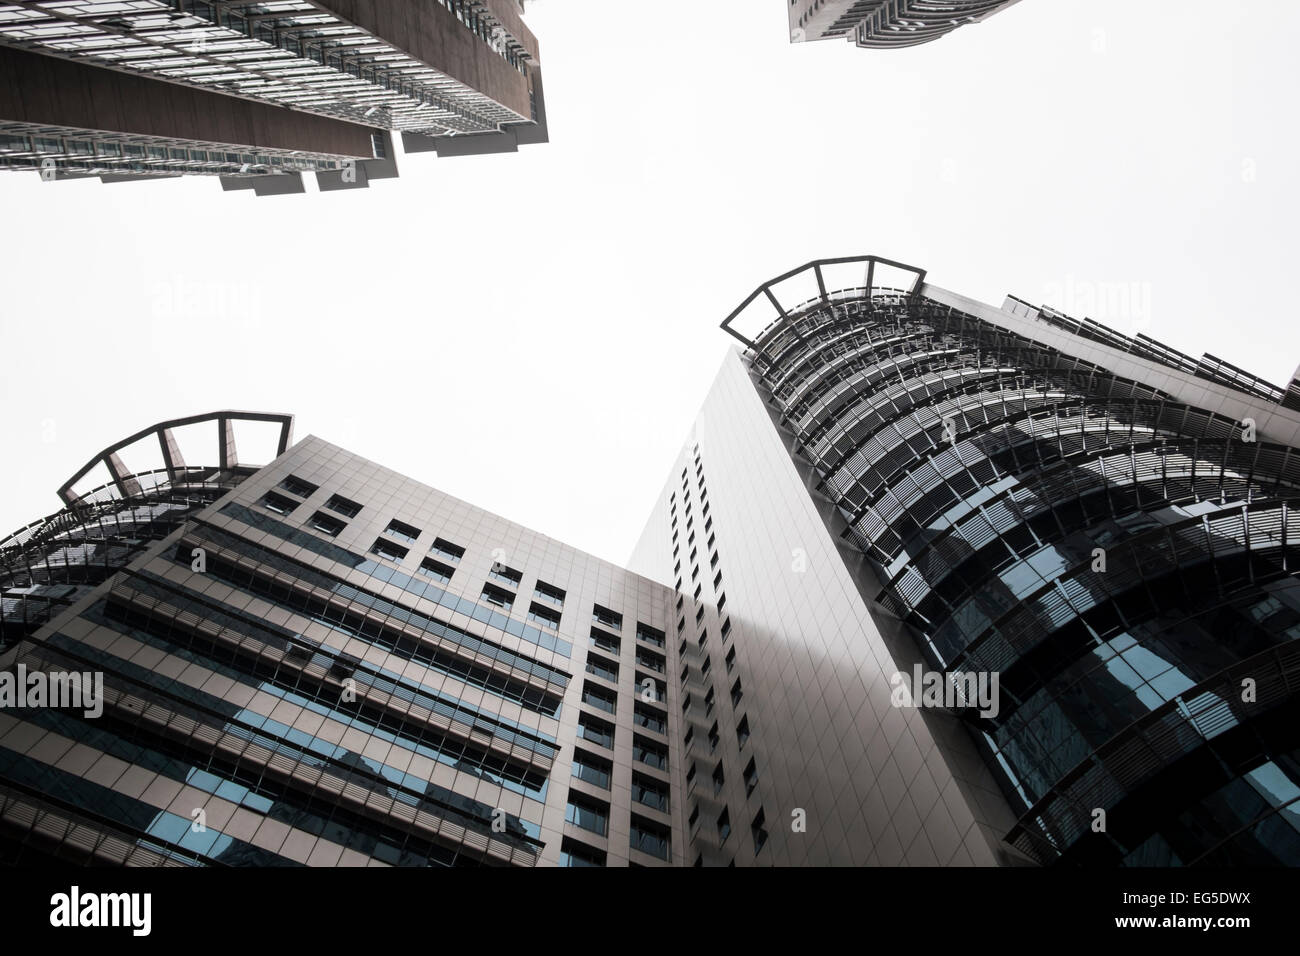 modern-architecture-in-kl-sentral-area-o